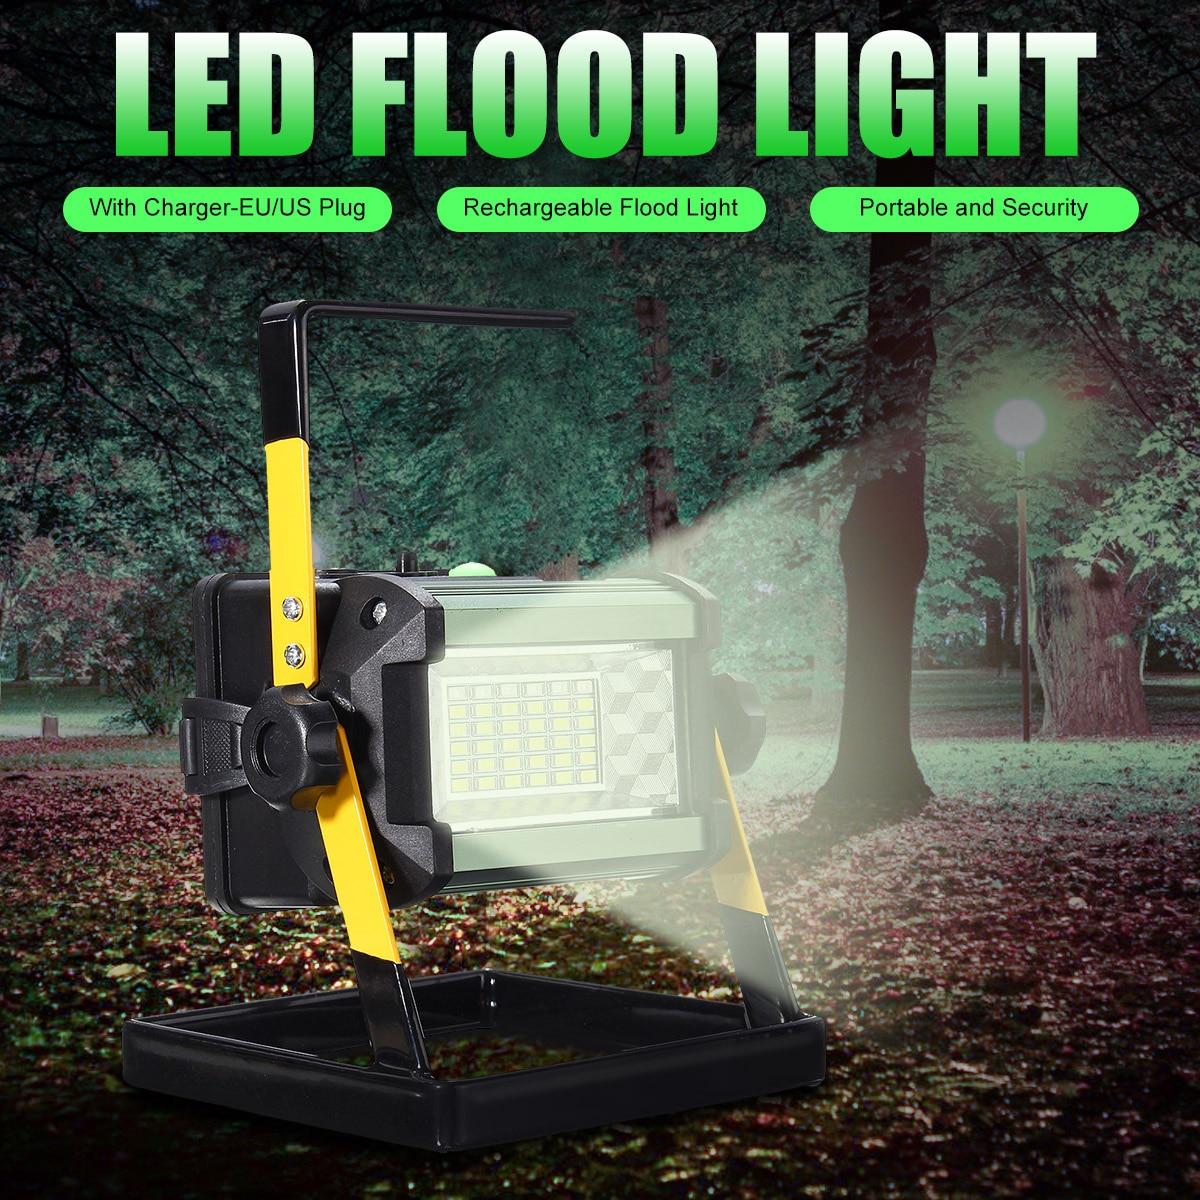 Led Flood Light Flashing: 50W Rechargeable Flood Spot Light 36LED EU/US Plug Camping